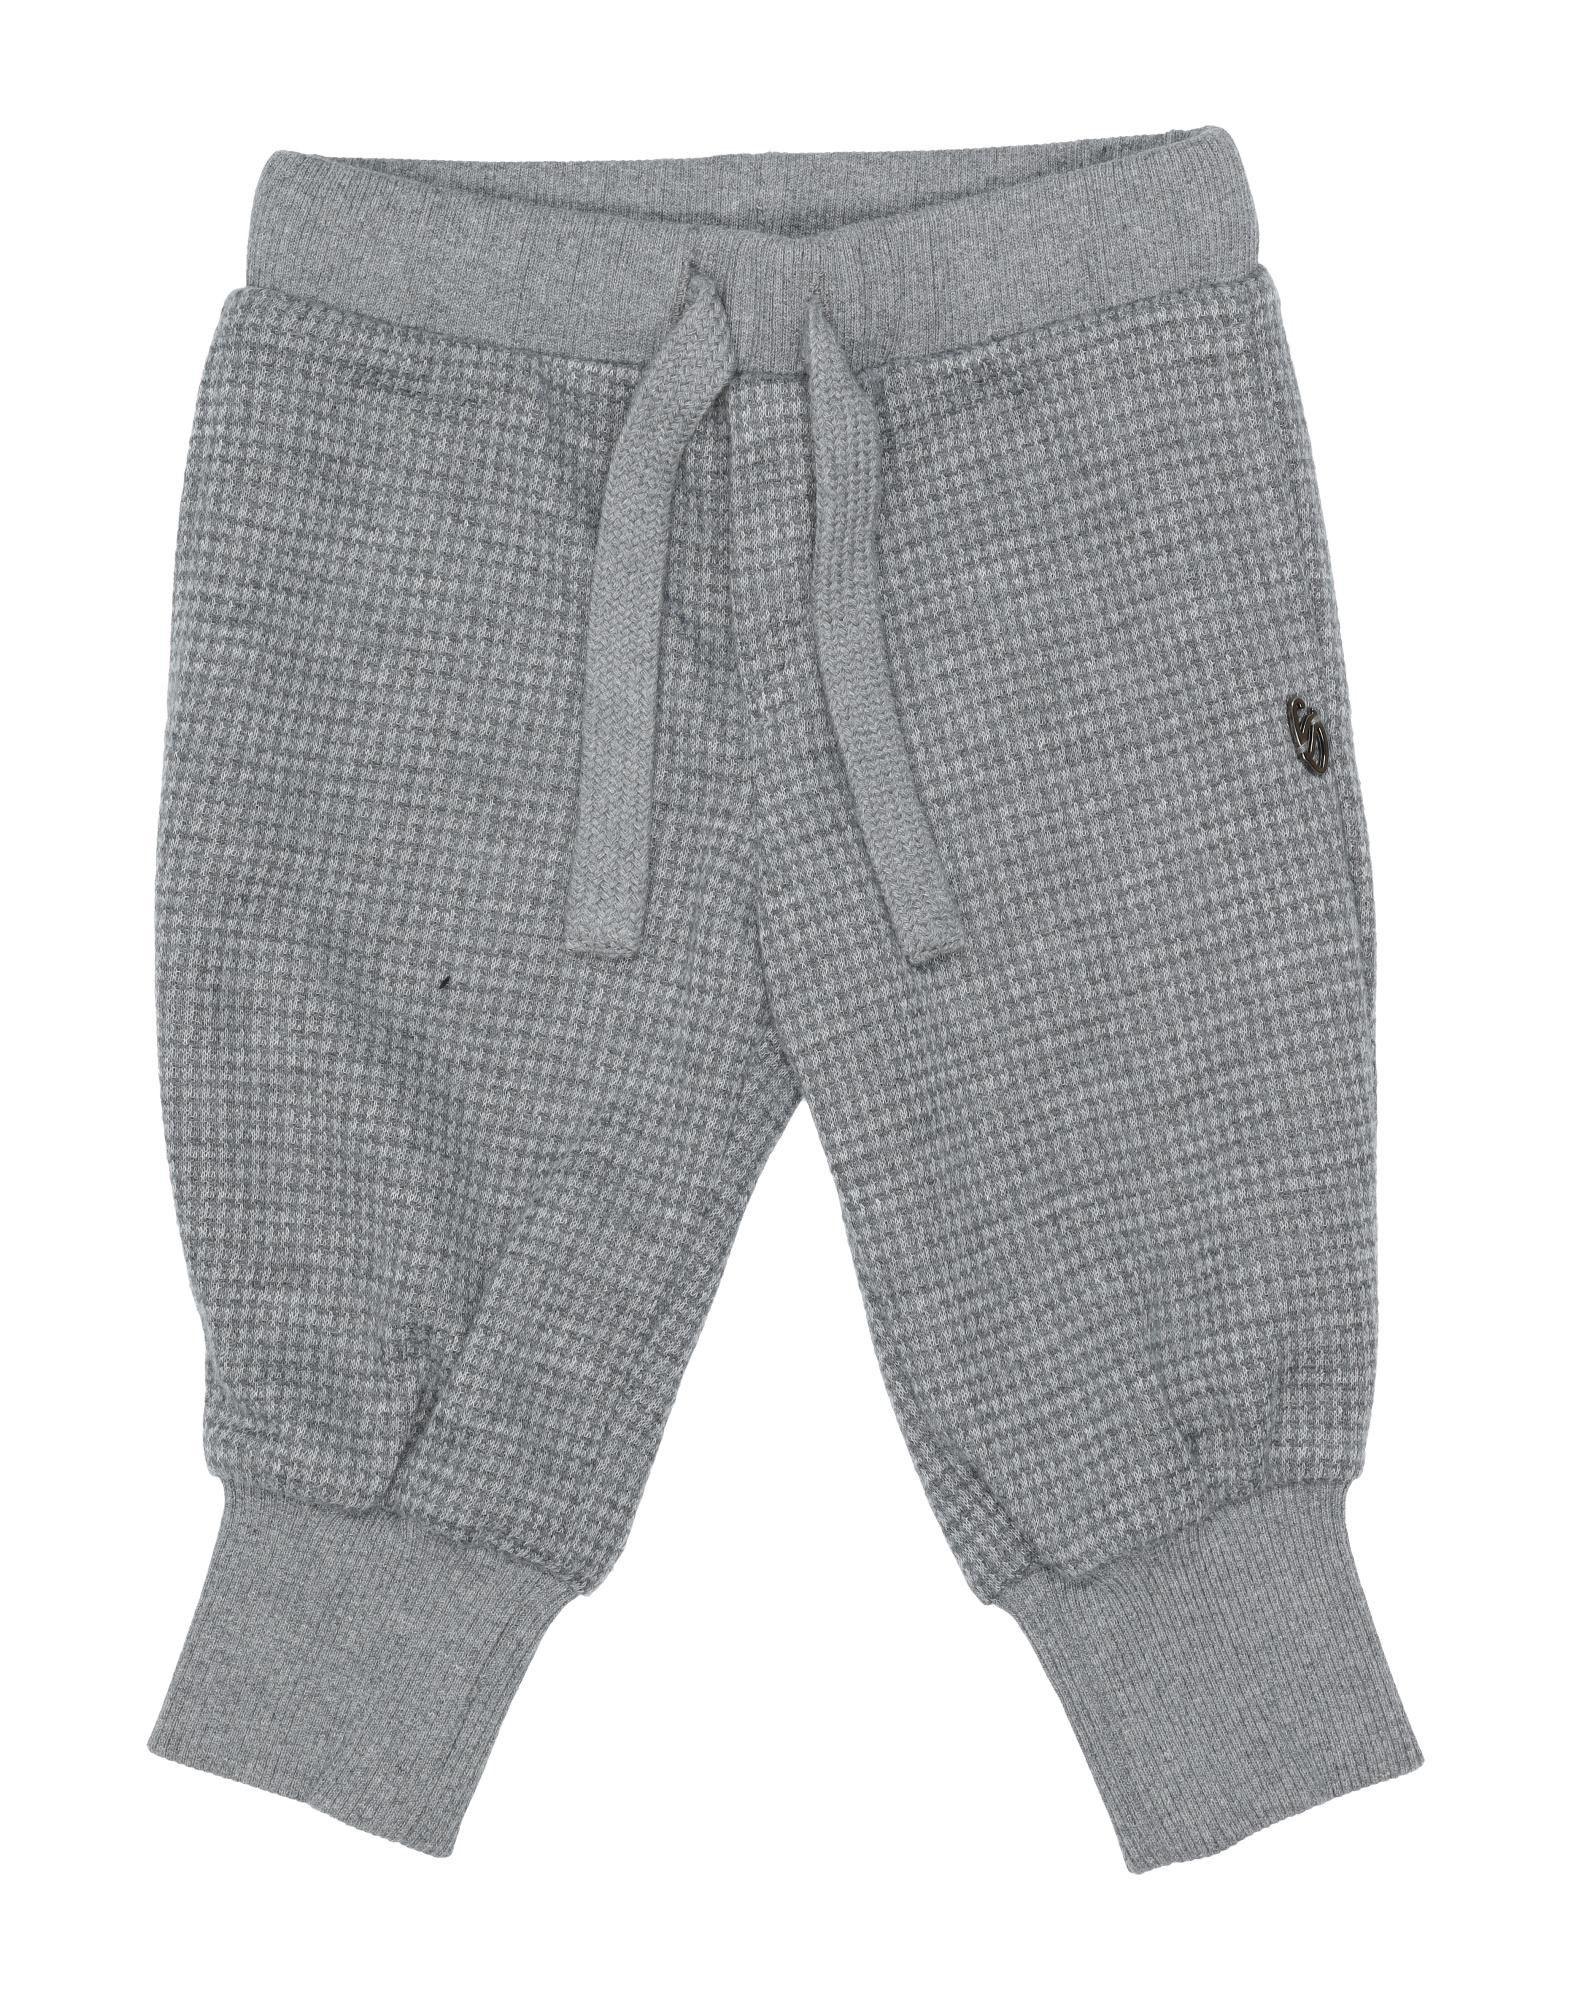 Grant Garçon Baby Kids' Casual Pants In Gray